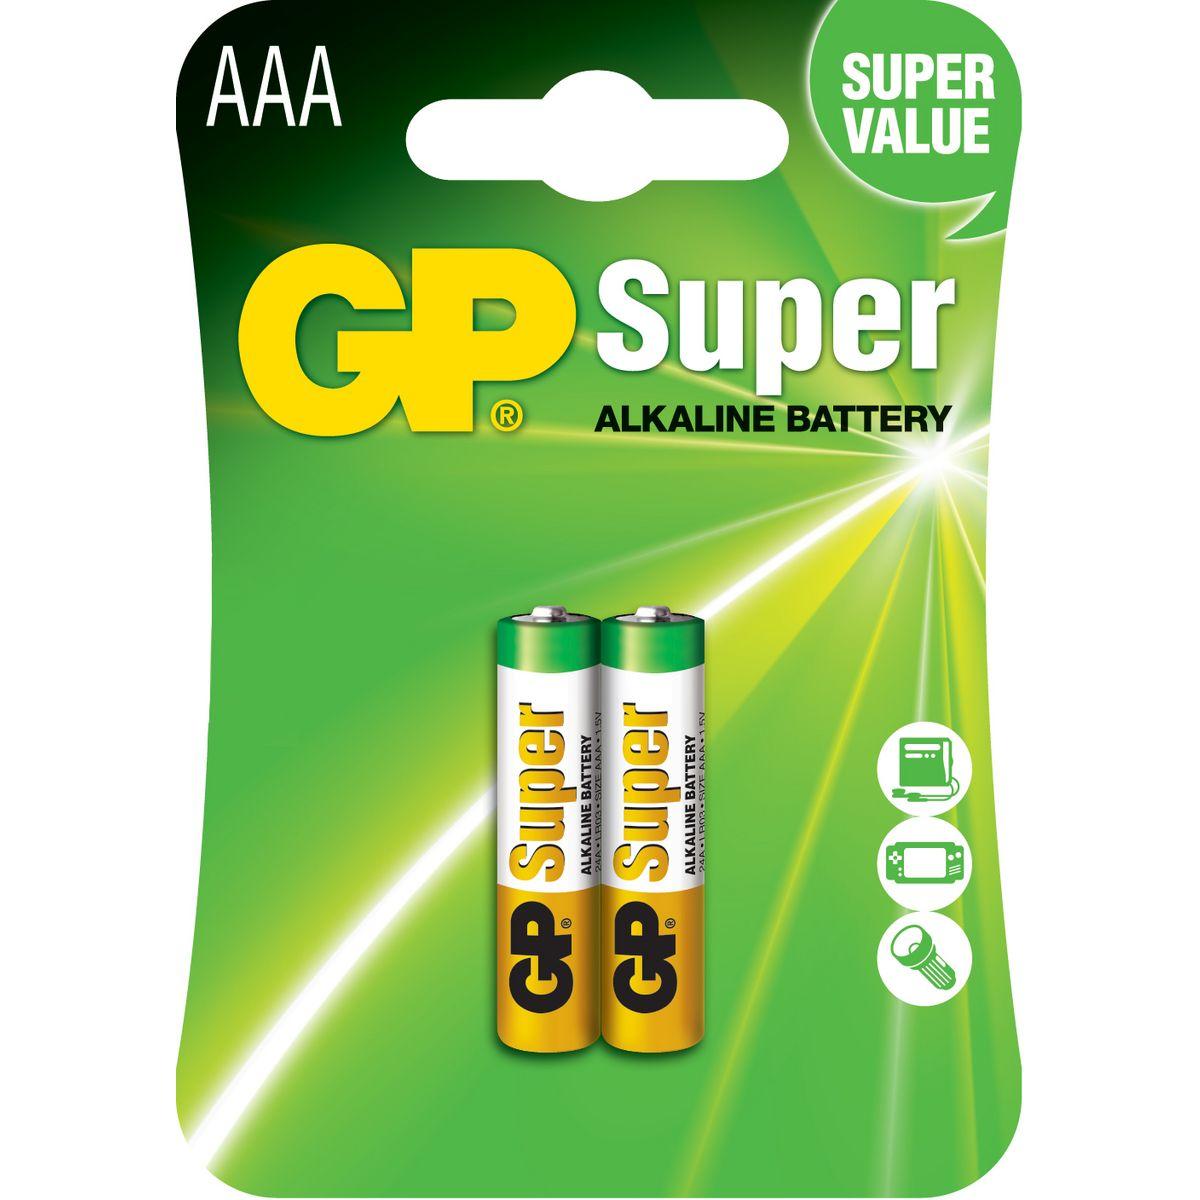 24AE-2U2 - Lot de 2 piles AAA Super Alcaline